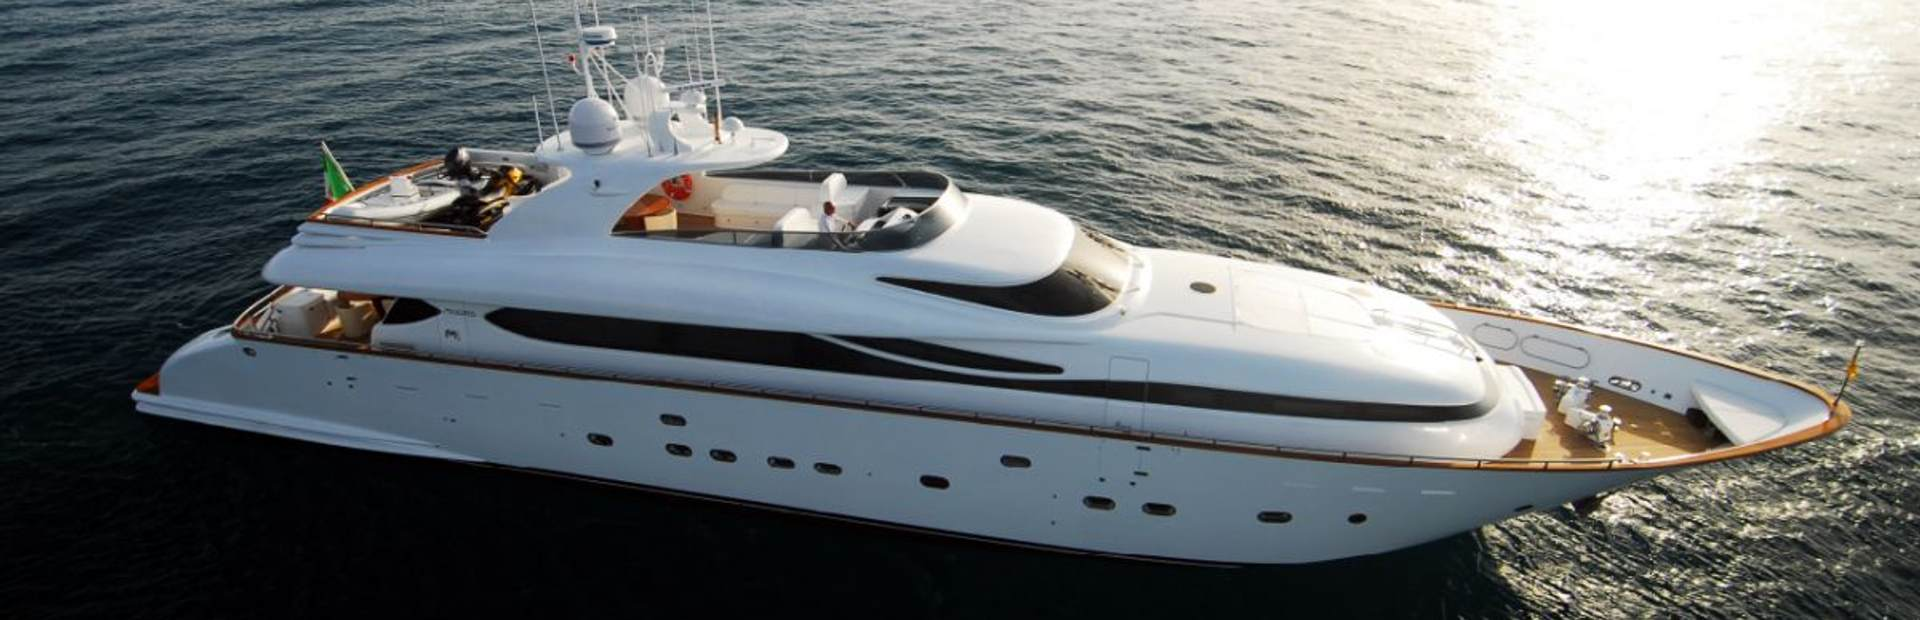 Maiora 33DP Yacht Charter